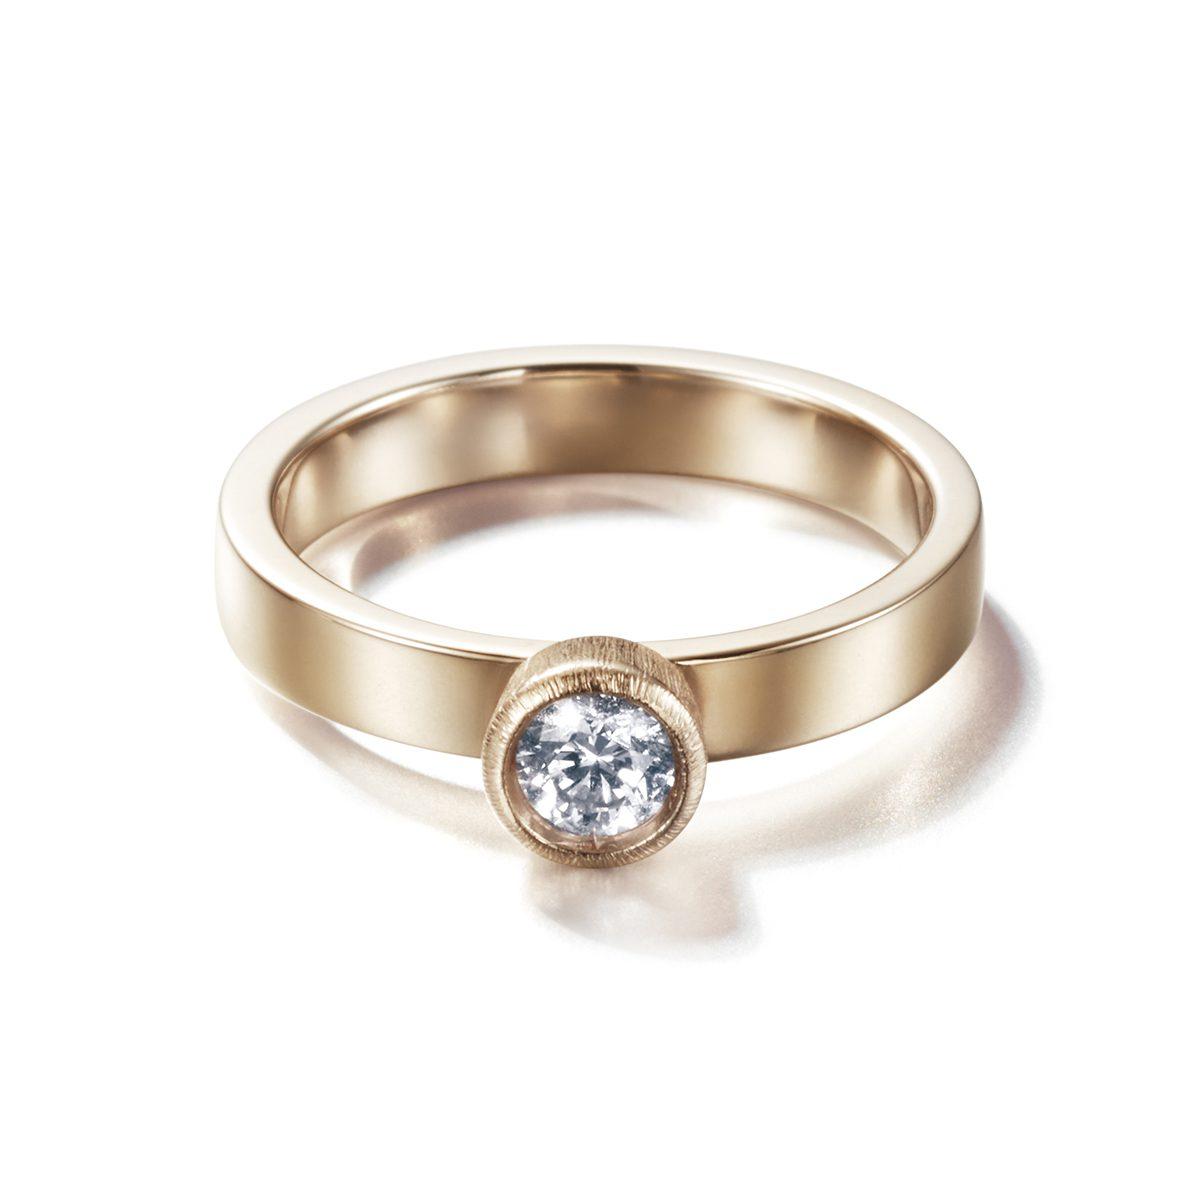 LIA DI GREGORIO TUNNEL|Engagement Rings